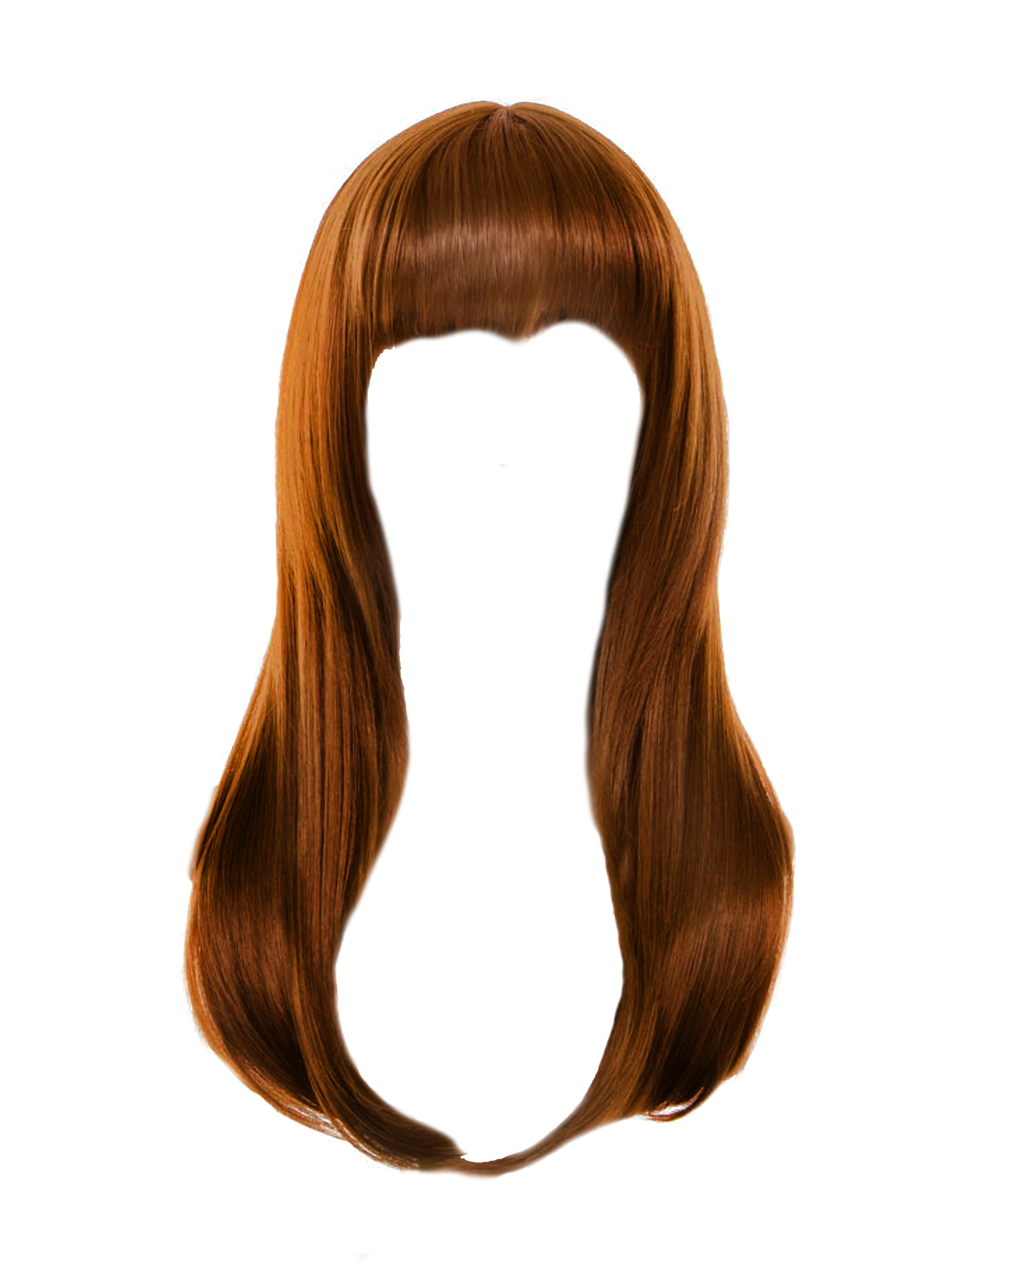 hair png - photo #41